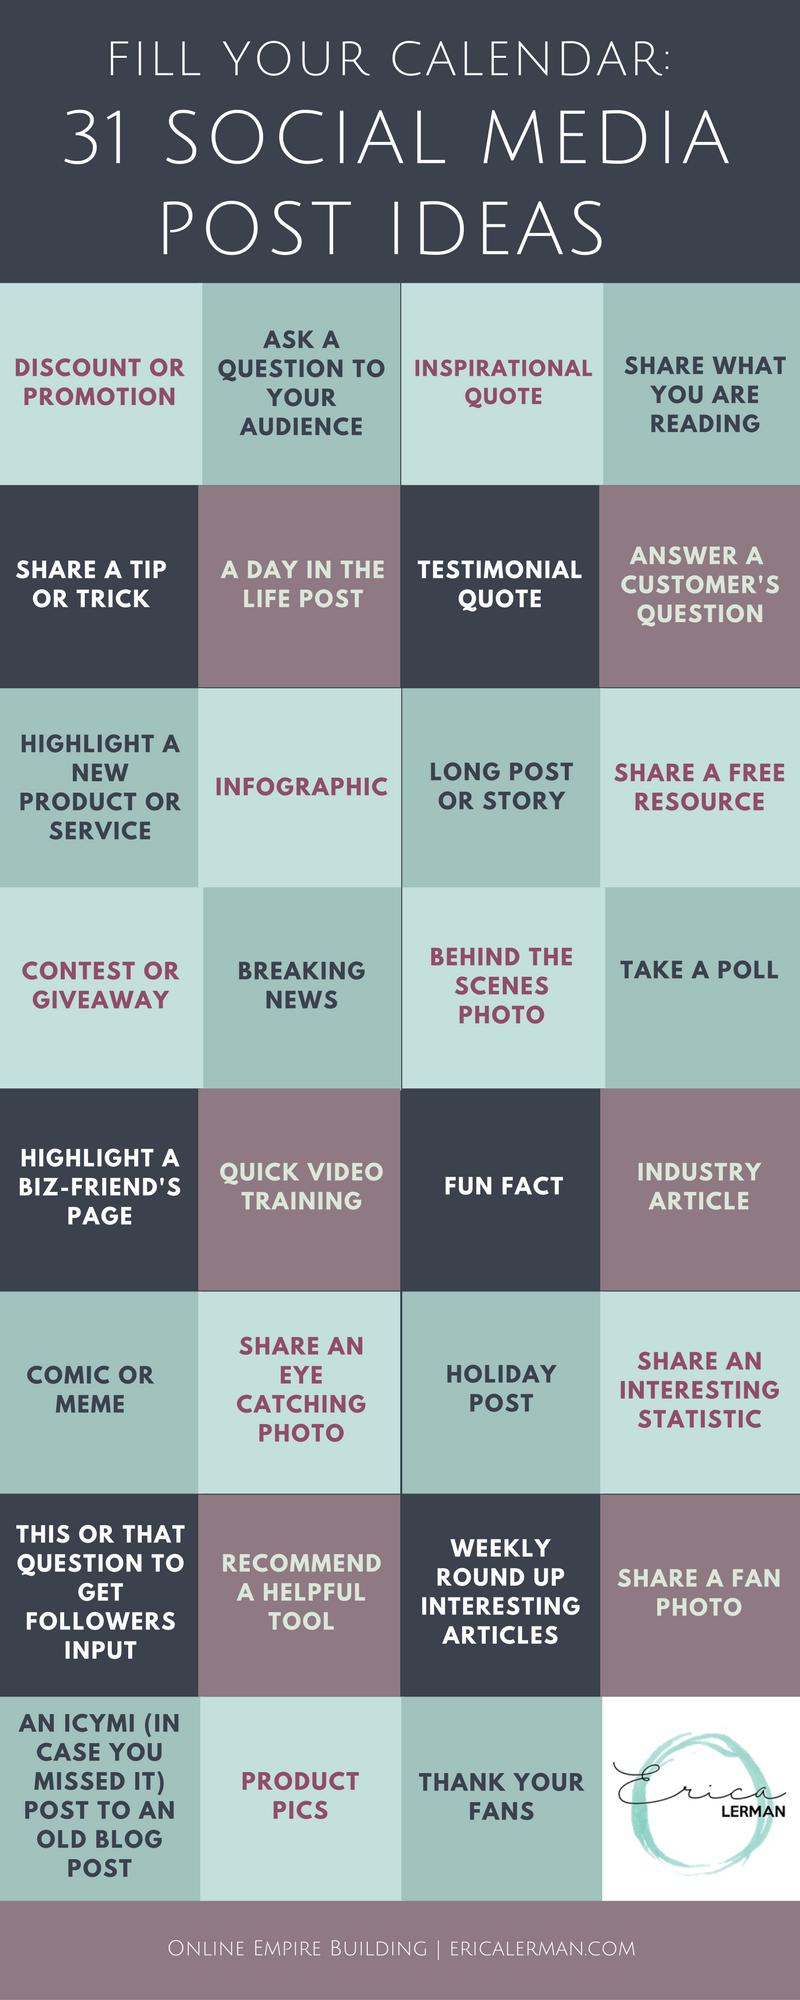 fill your social media calendar with 31 post ideas | marketing ideas